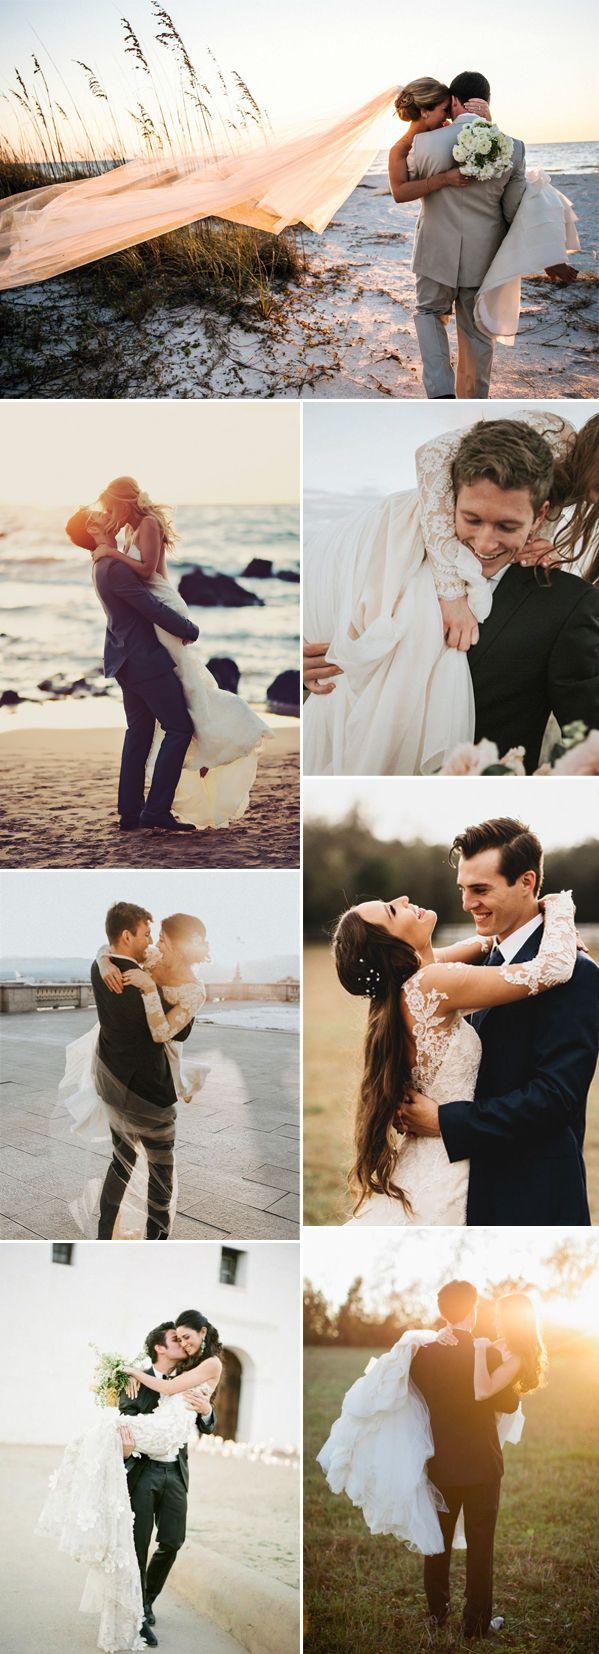 attractive wedding photos  that bridegroom put up the bride